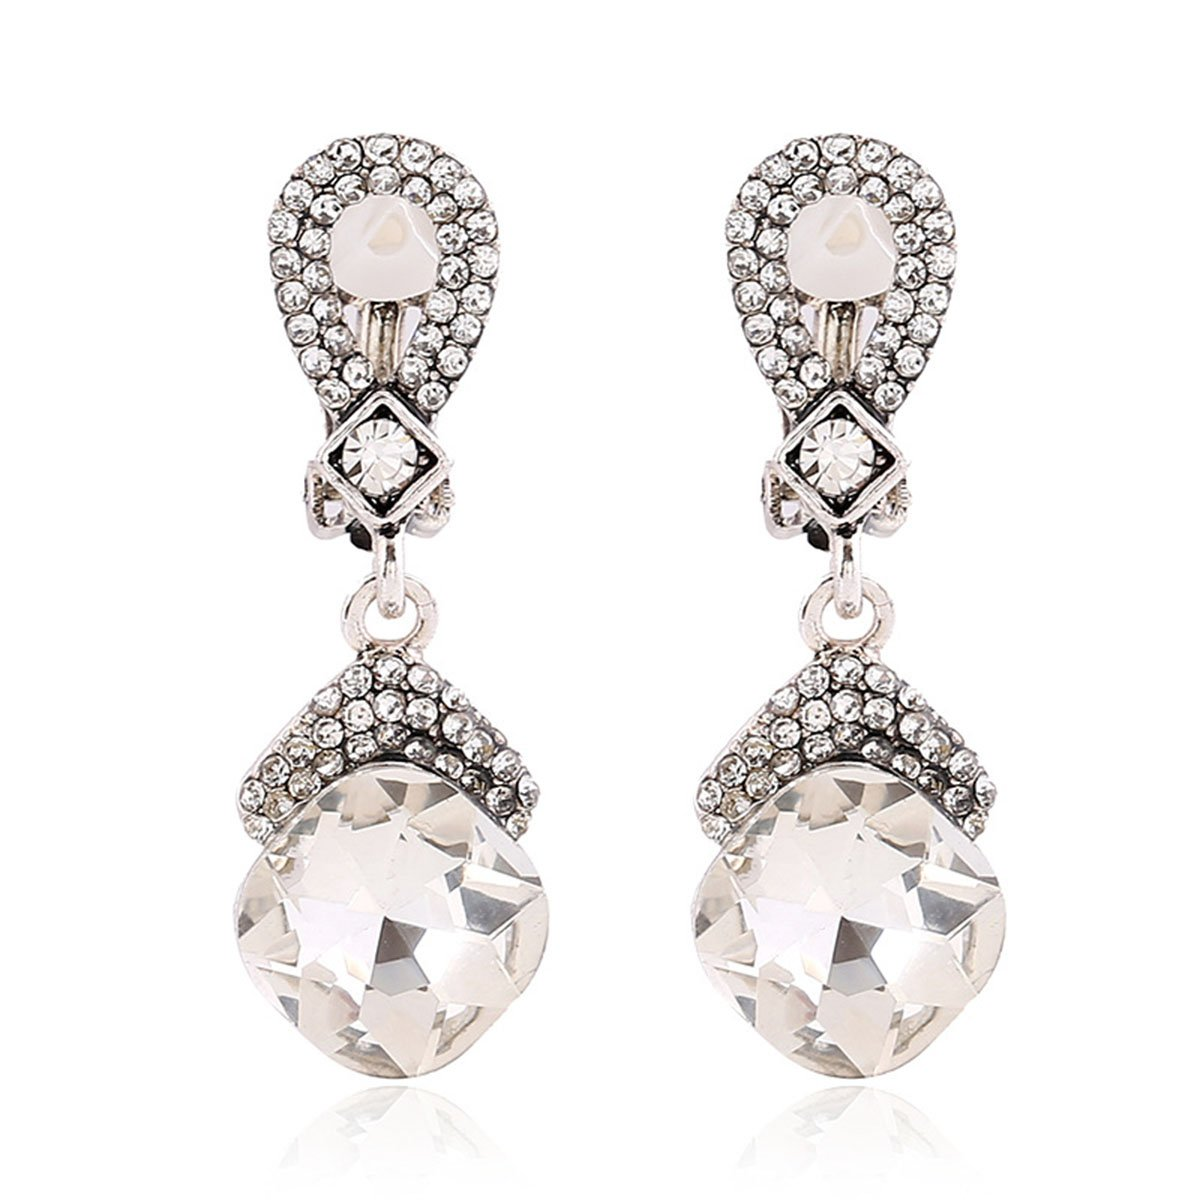 Grace Jun Vintage Silver Plated Austria Crystal Clip on Earrings No Pierced Feminine Ear Clip